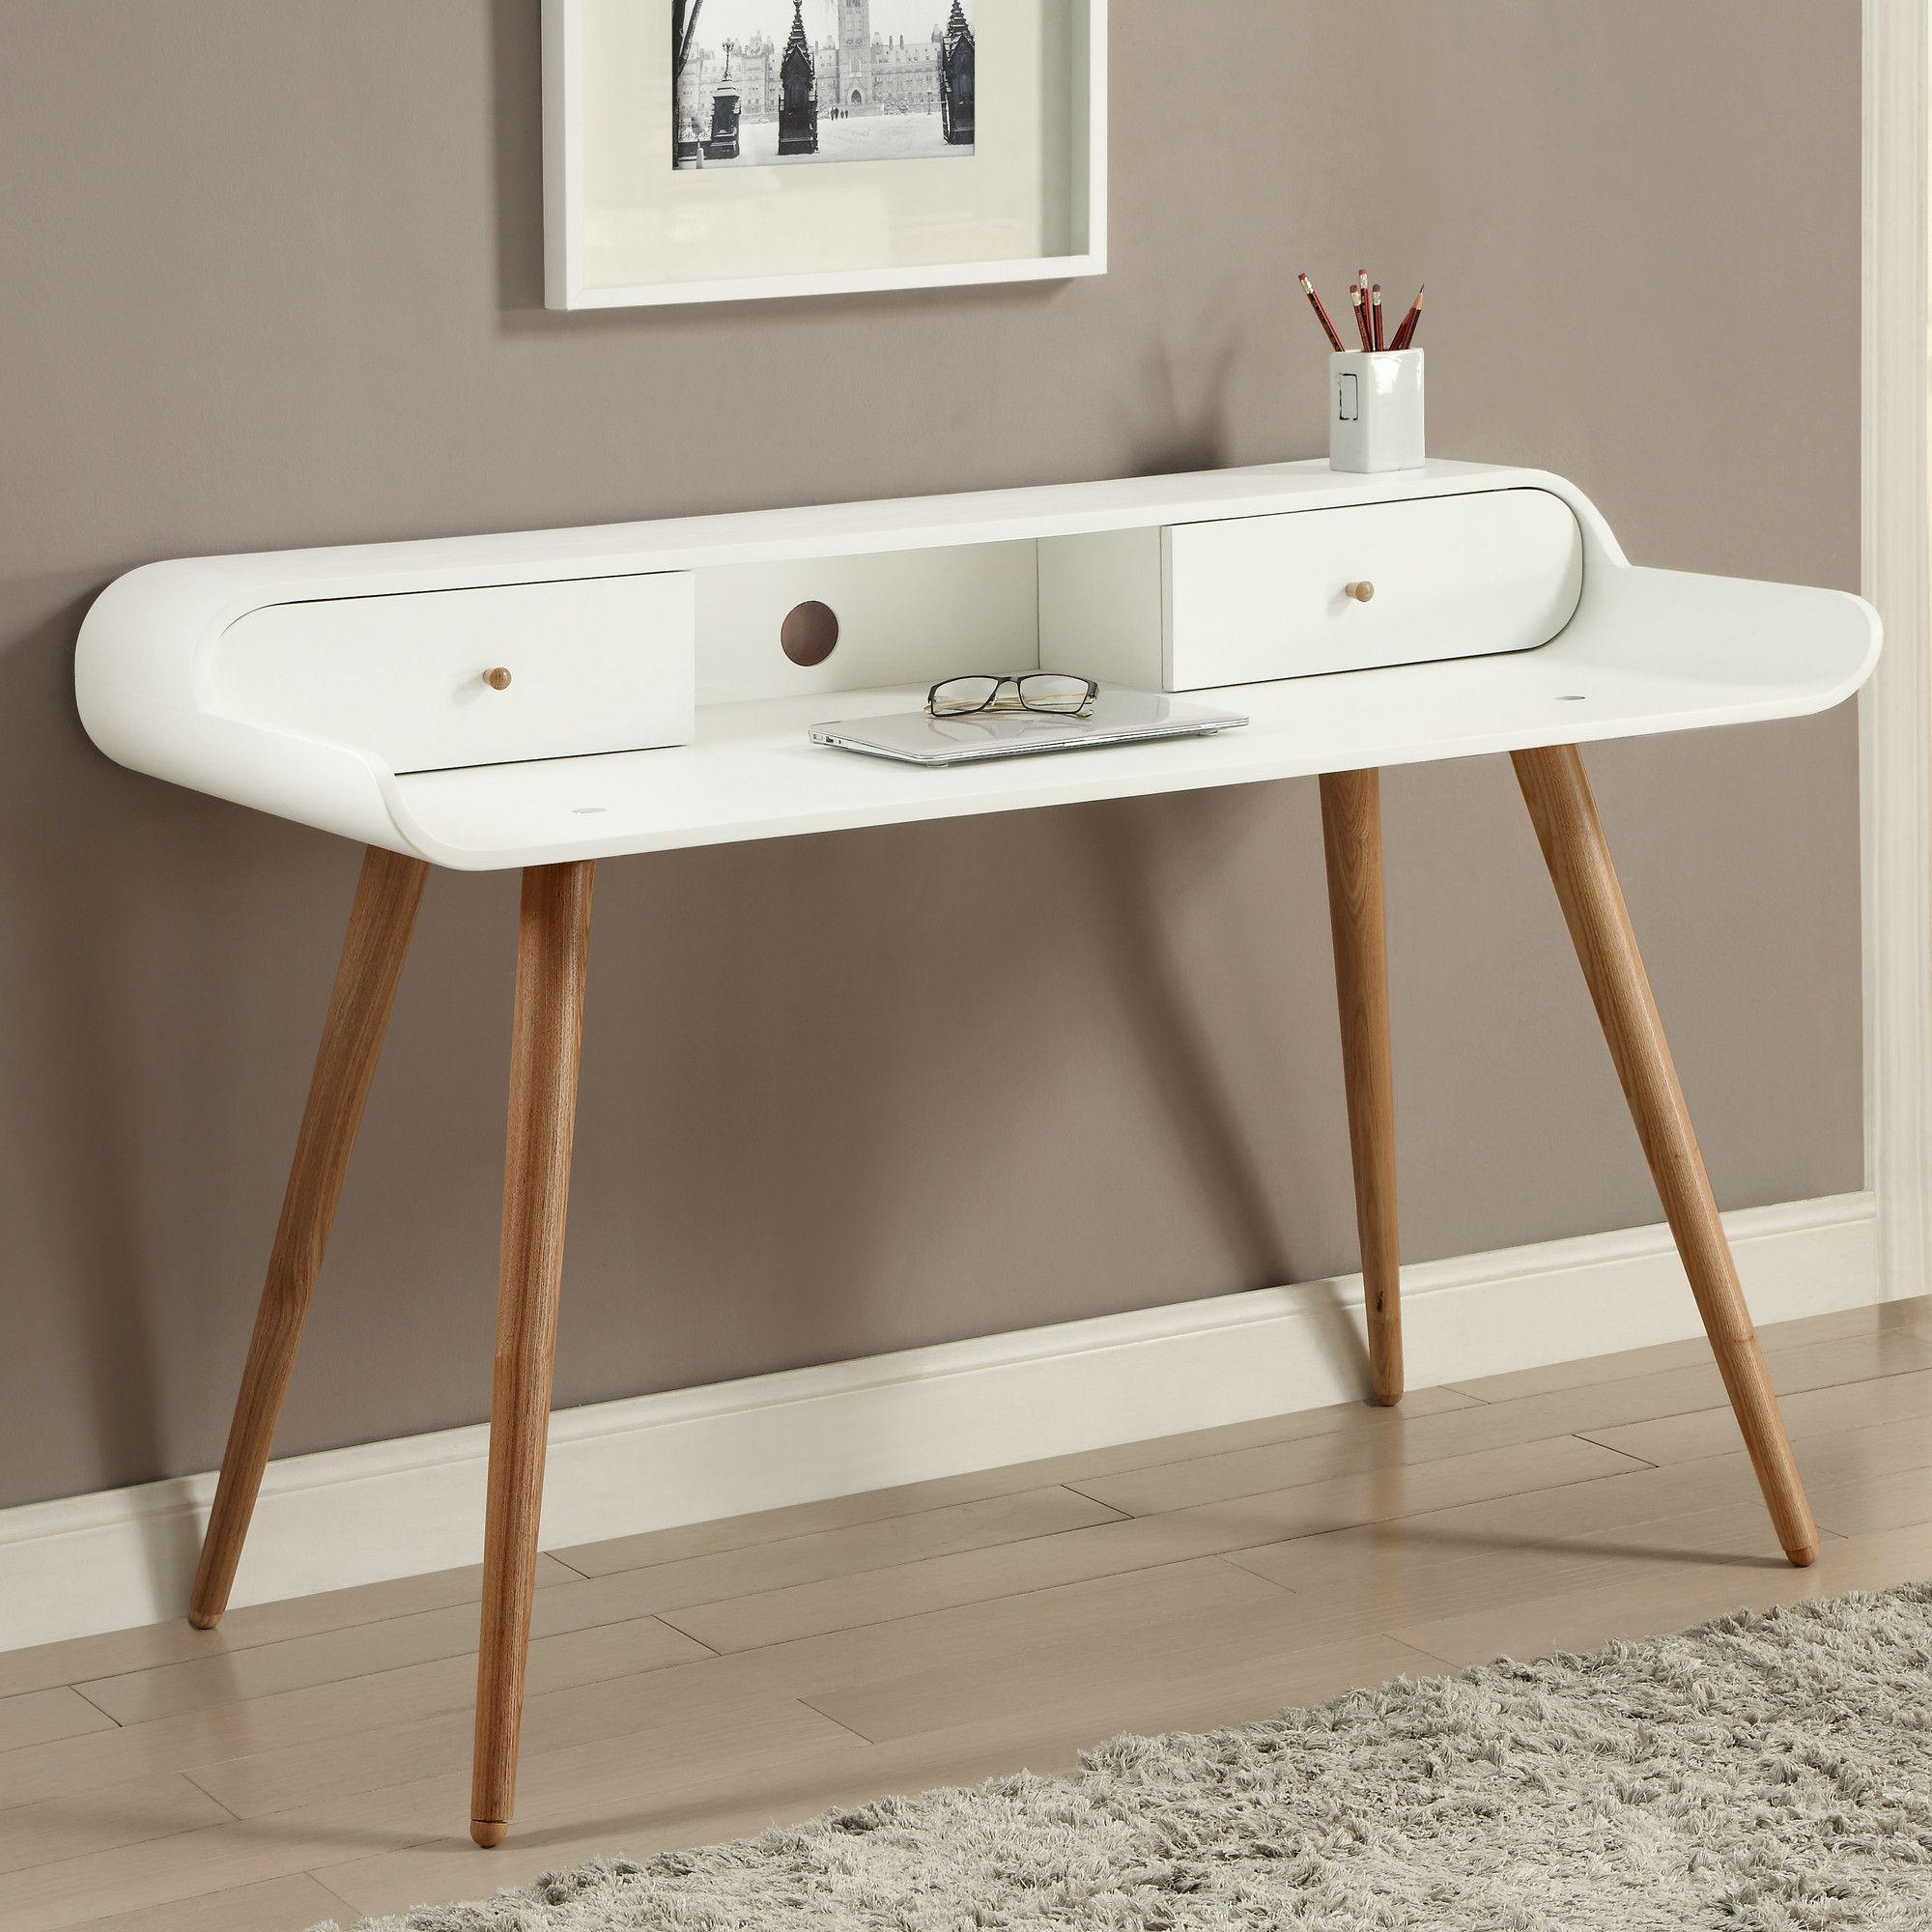 Jual Home Office Writing Desk Reviews Wayfair Uk Home Office Furniture White Desks Office Furniture Accessories